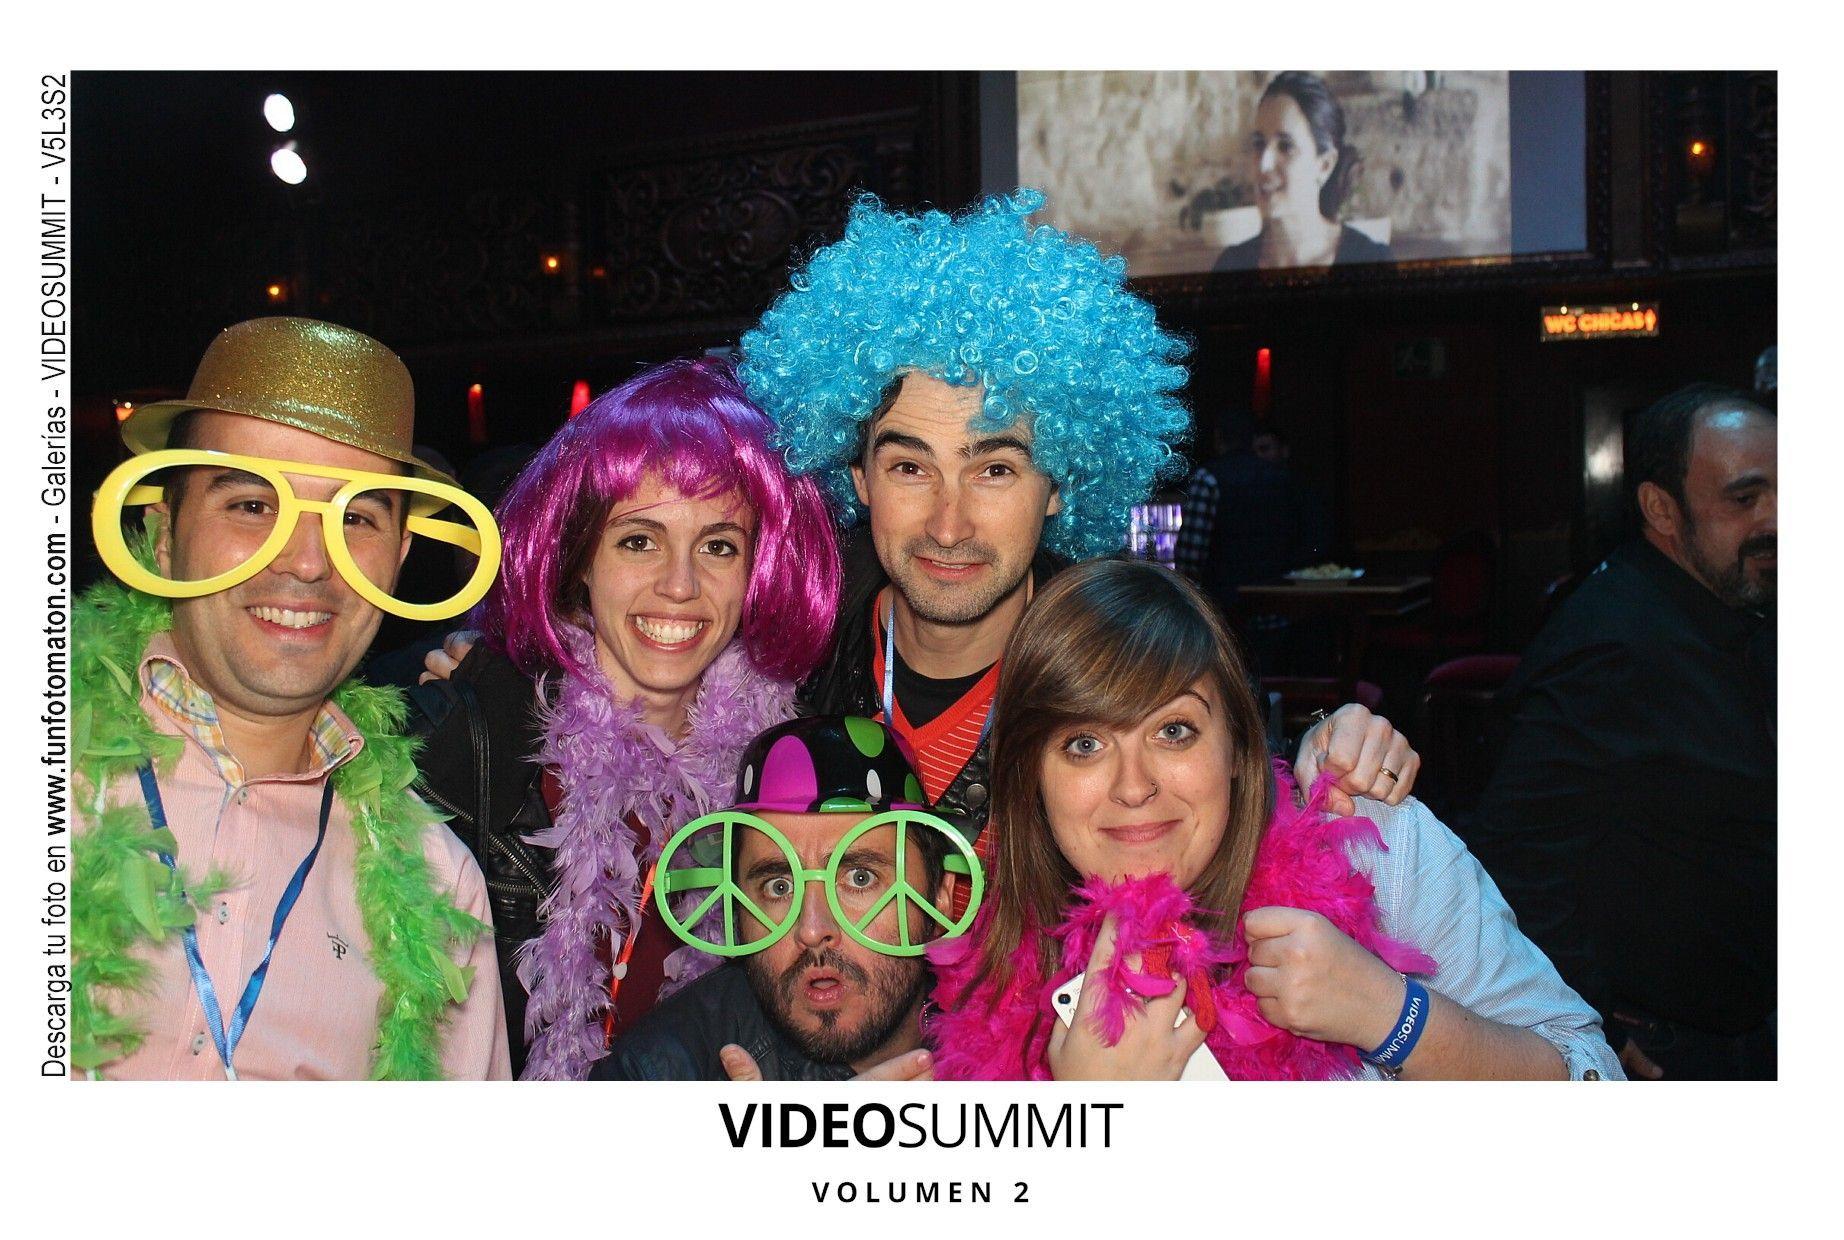 videosummit-vol2-club-party-068